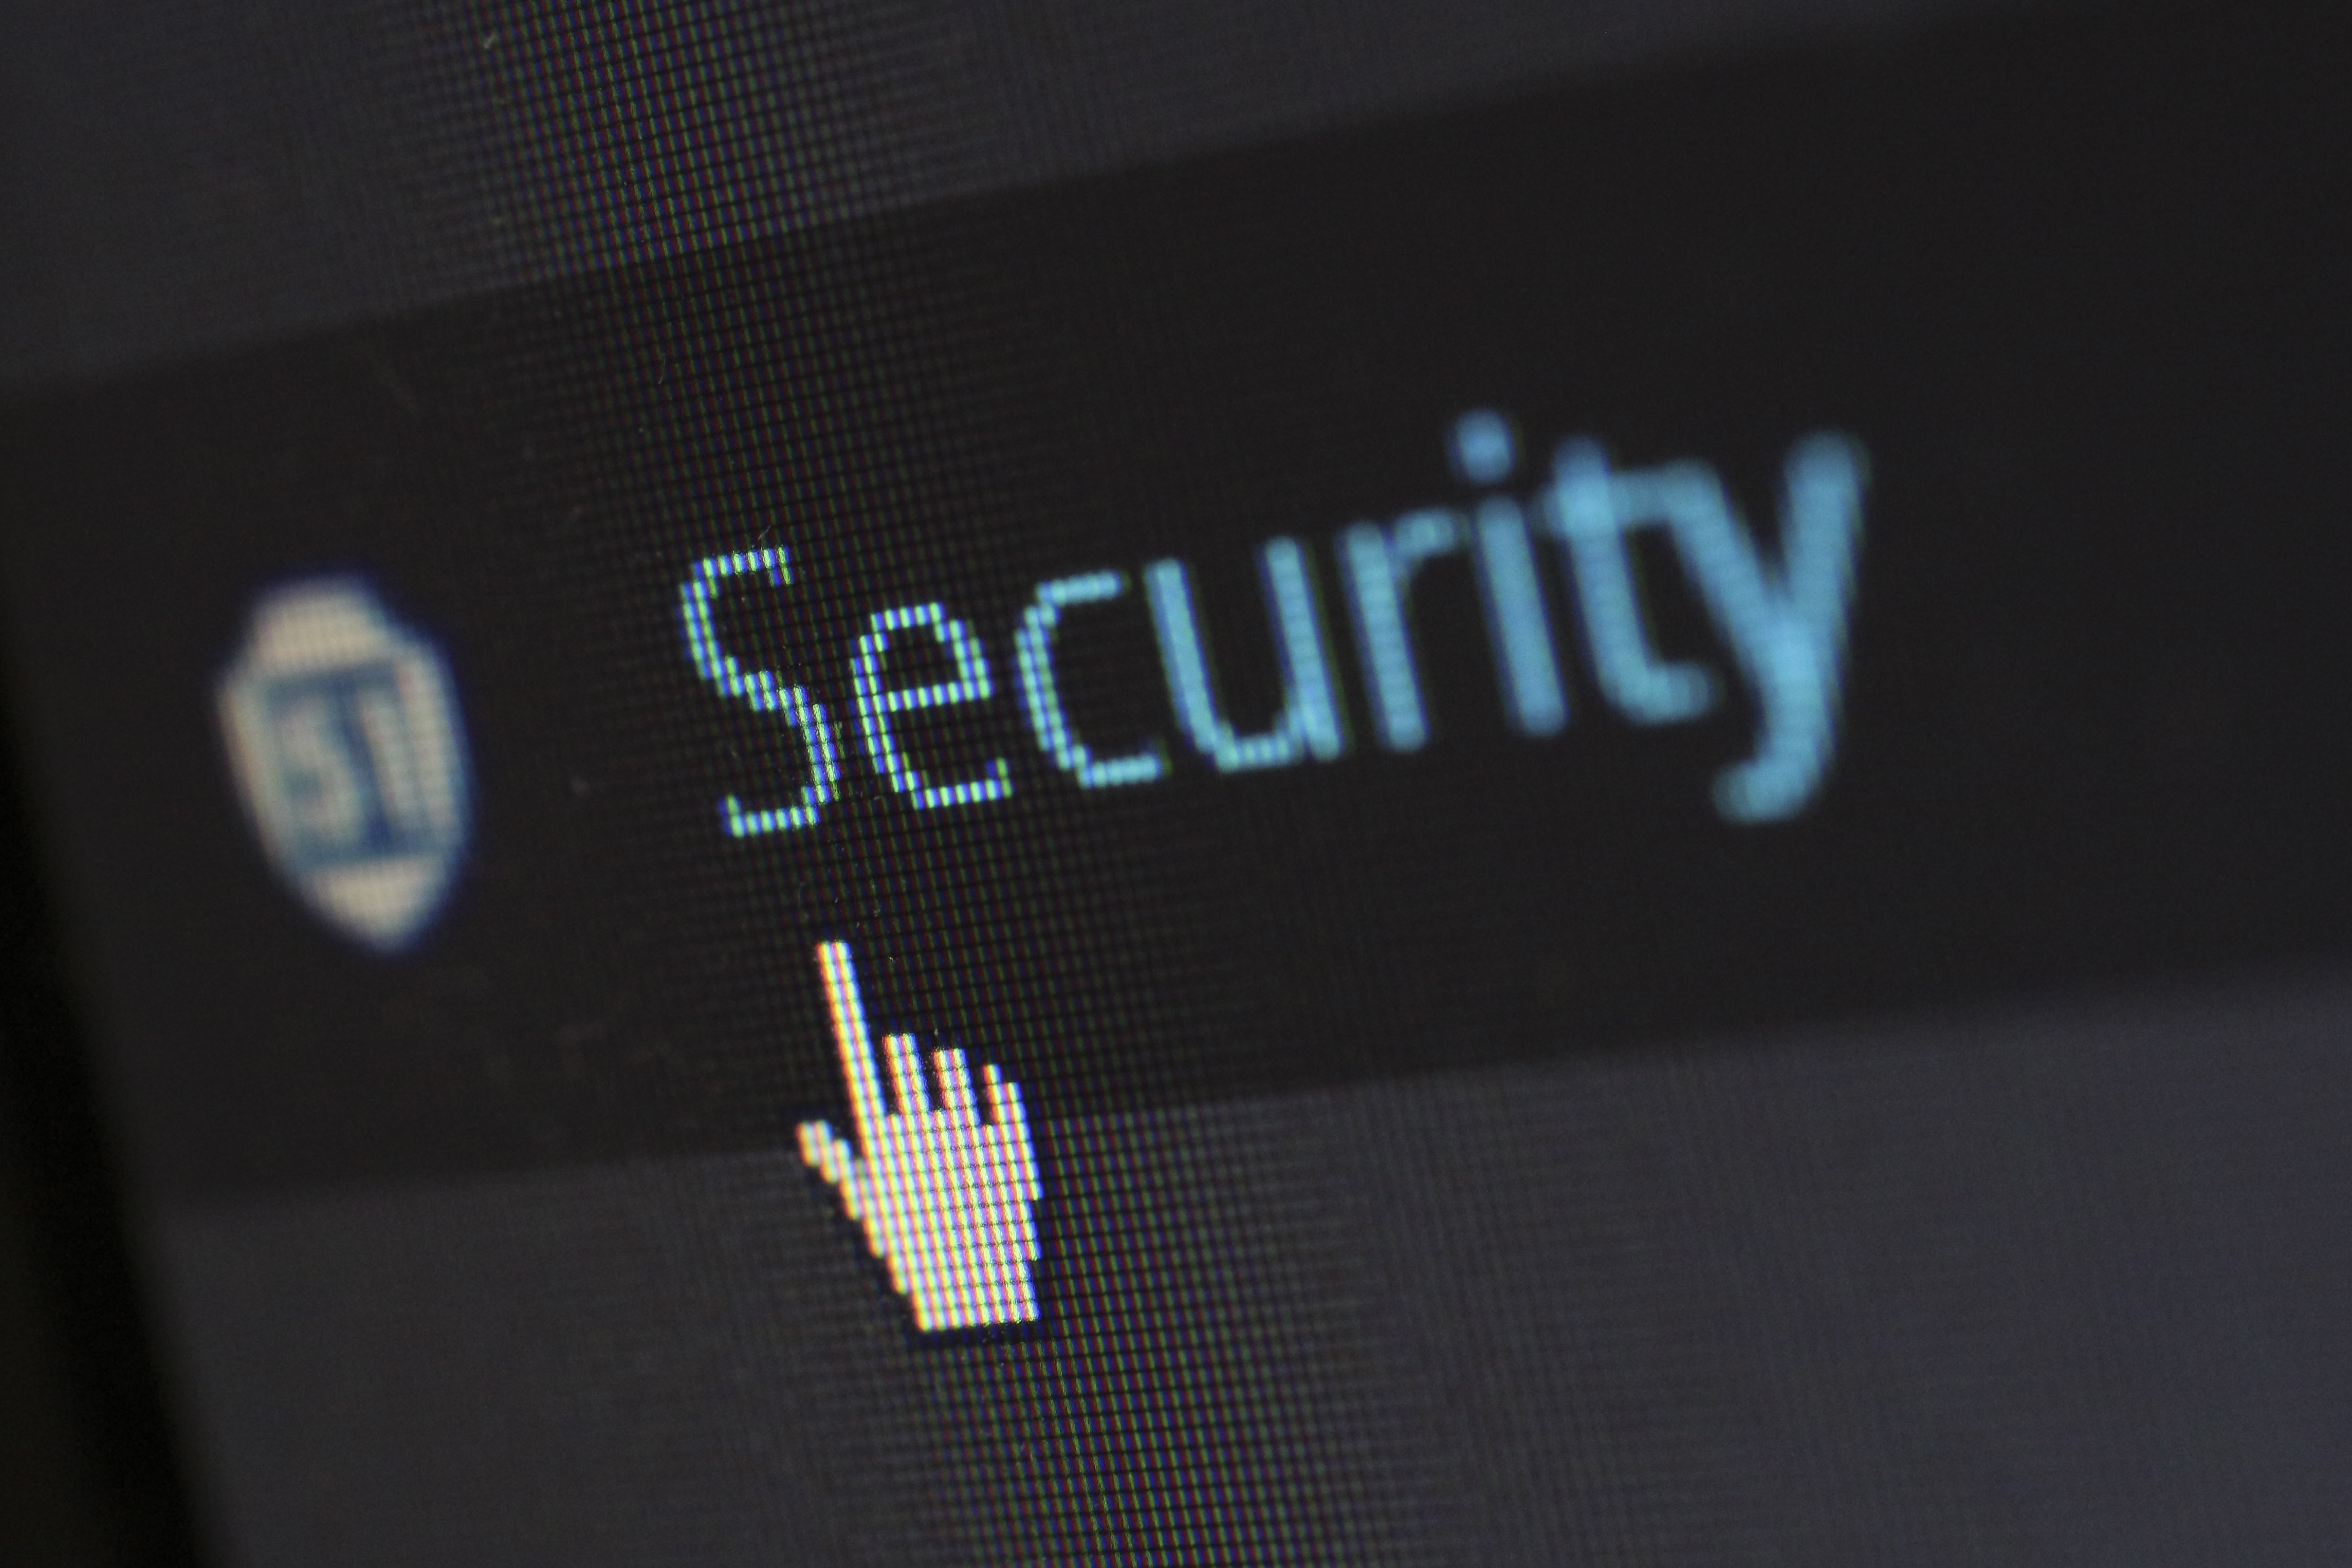 Loan data security